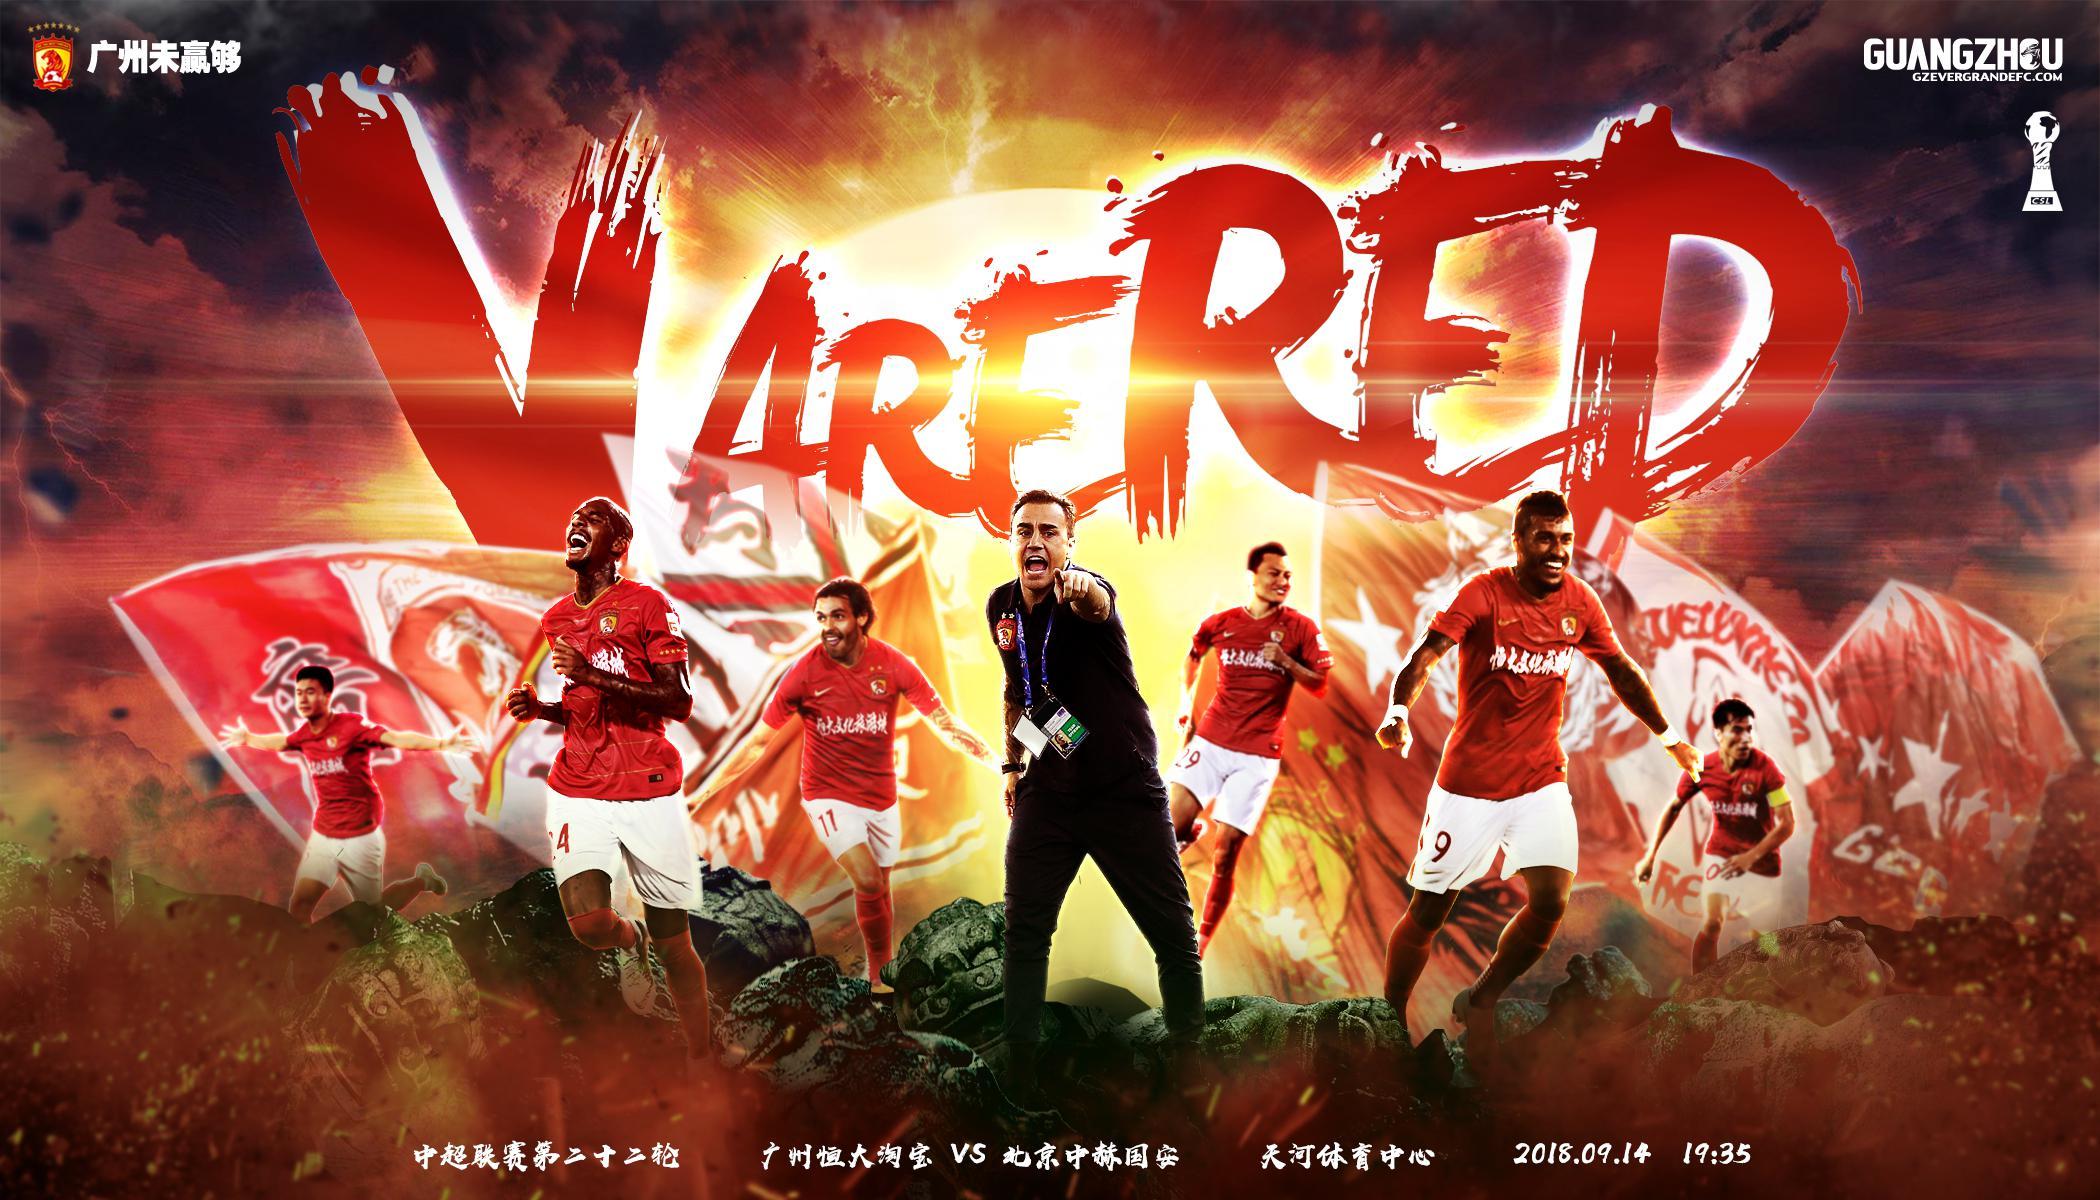 恒大发战国安海报:V ARE RED! 国安海报:向着胜利